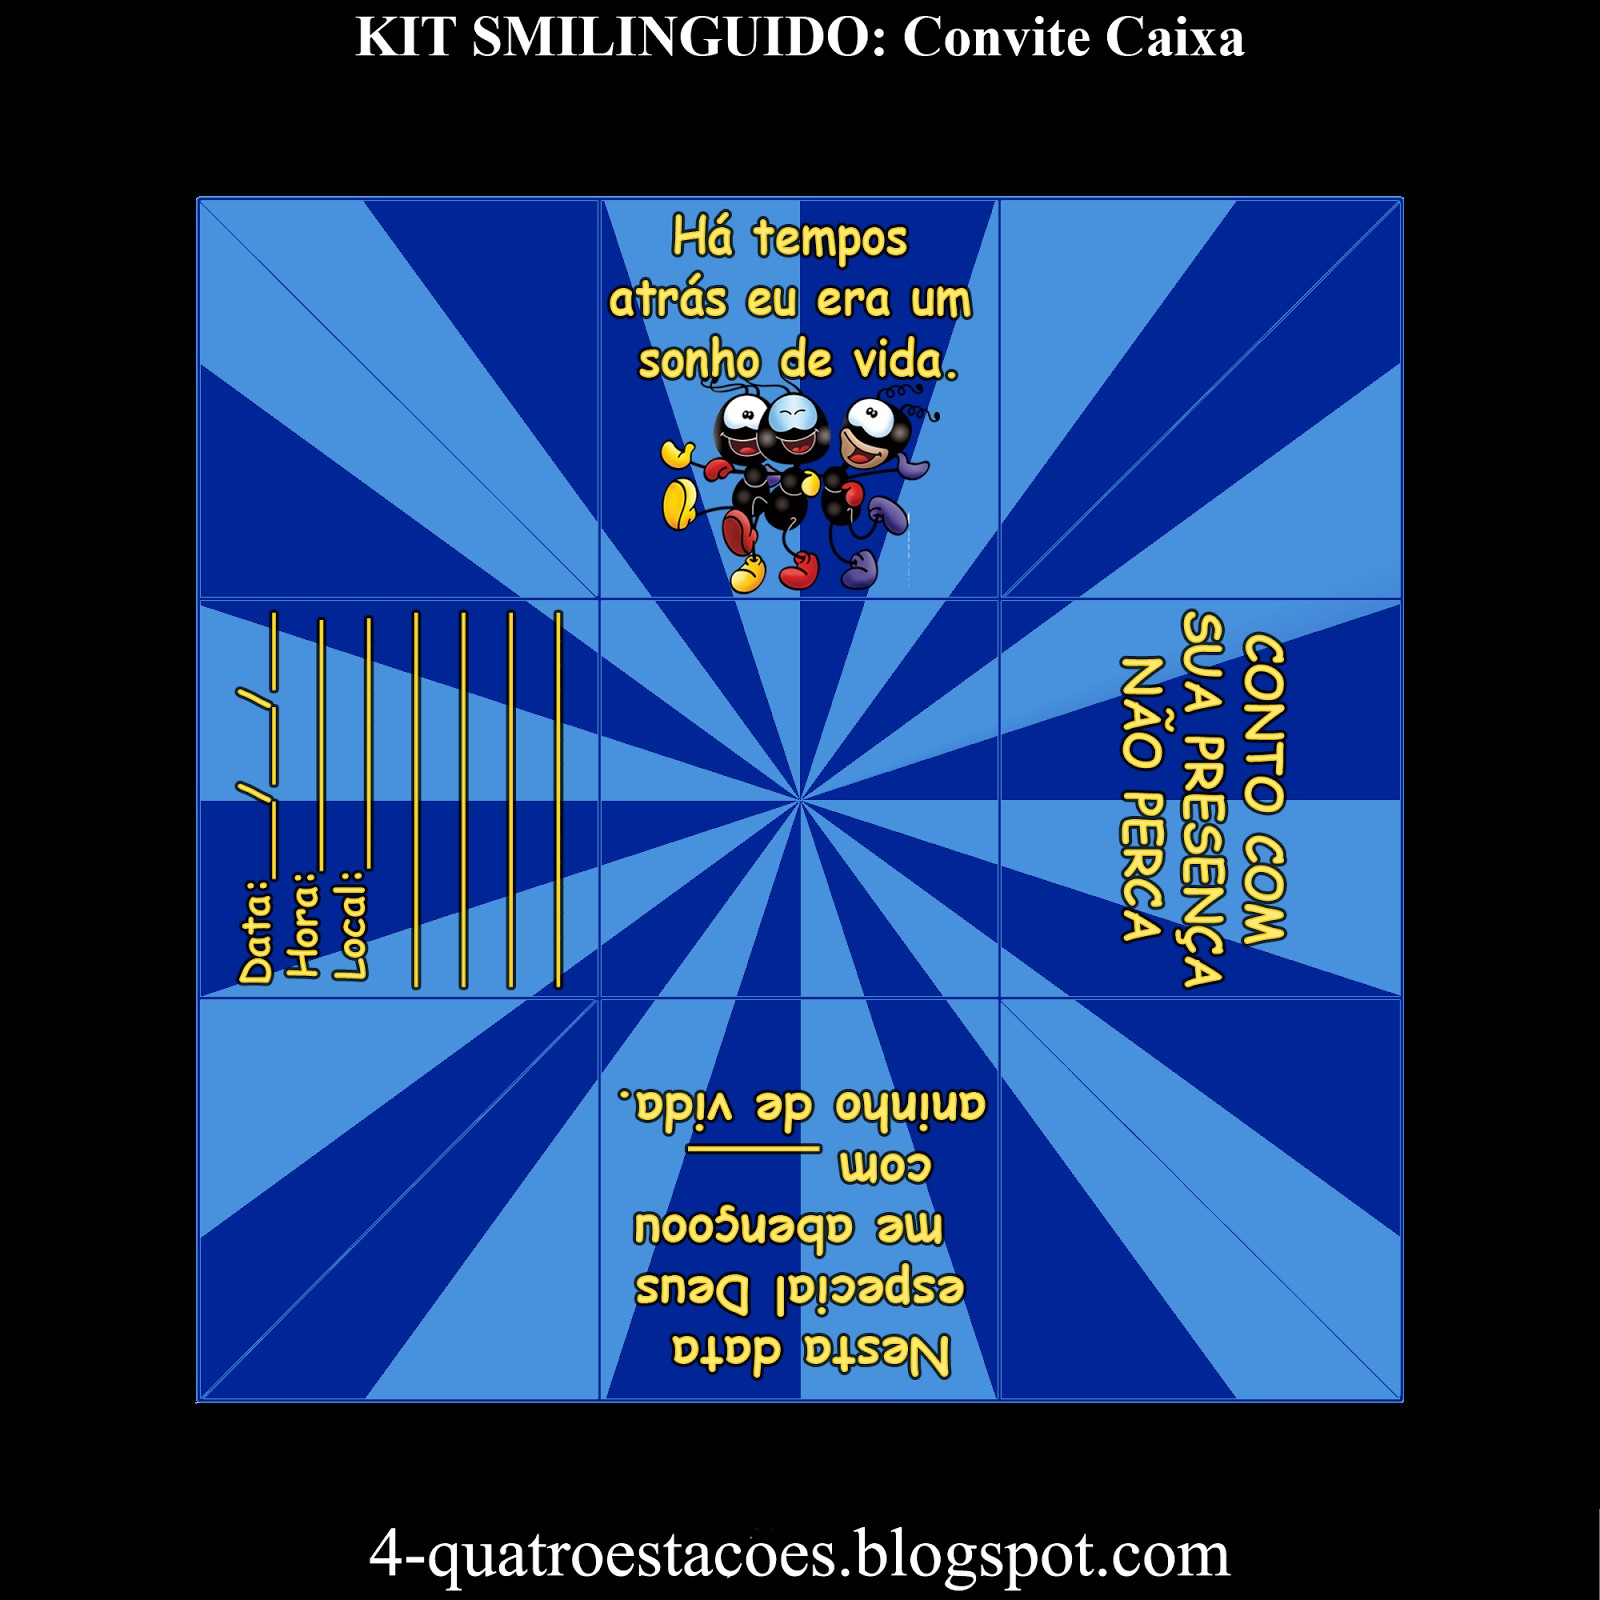 Calendário De Mesa Para Imprimir 2019 Gratis Actual Quatro Esta‡•es Kit Festa Smilinguido Itens Básicos Of Calendário De Mesa Para Imprimir 2019 Gratis Más Actual Calendario Novembro 2018 Imprimir T